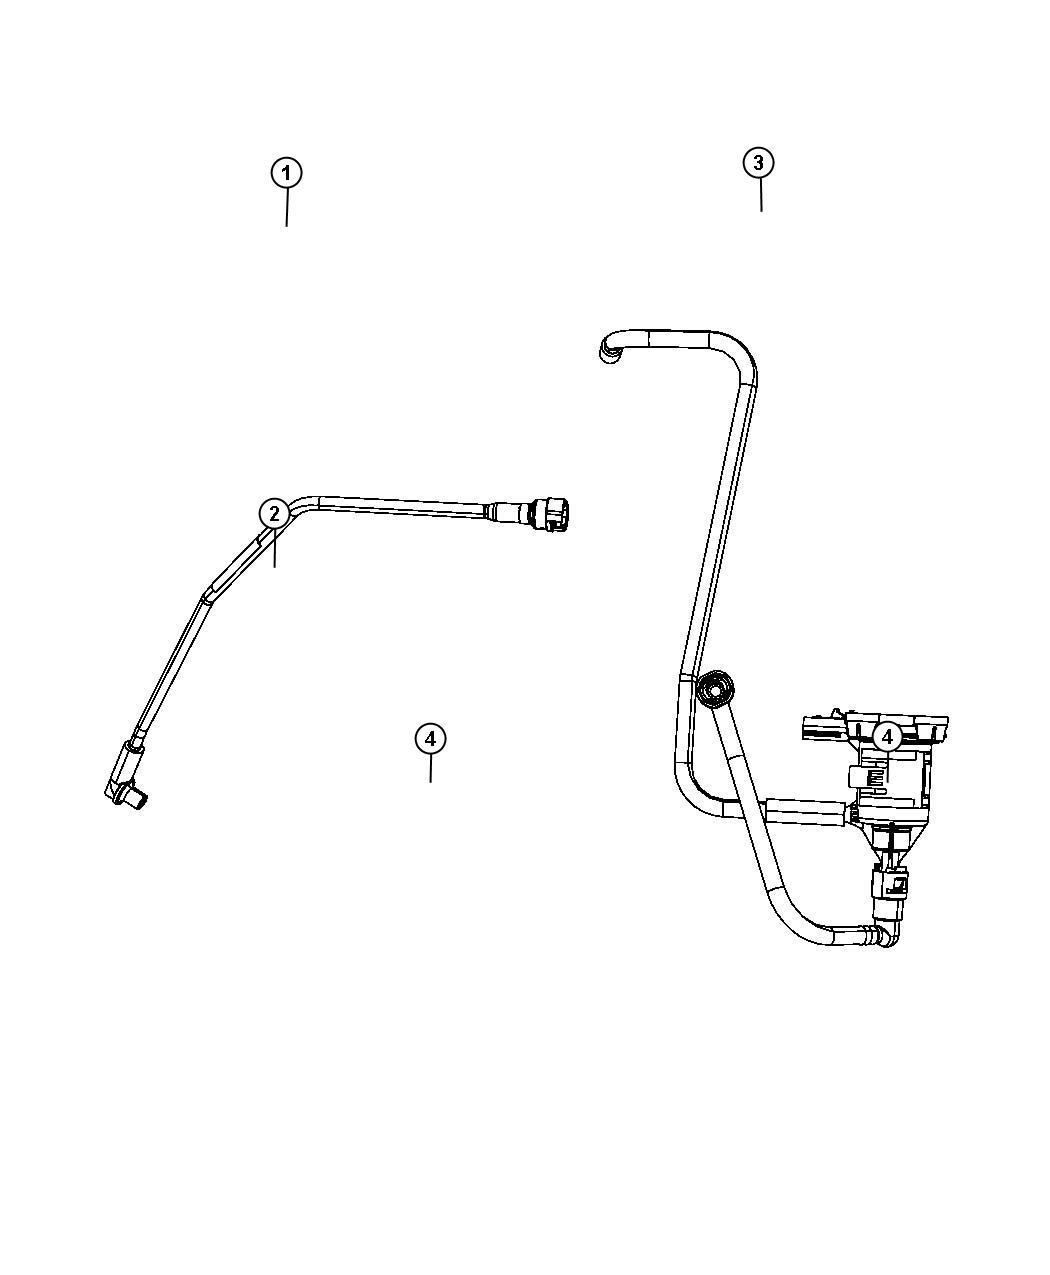 Dodge Journey Harness Vapor Canister Purge Includes Item